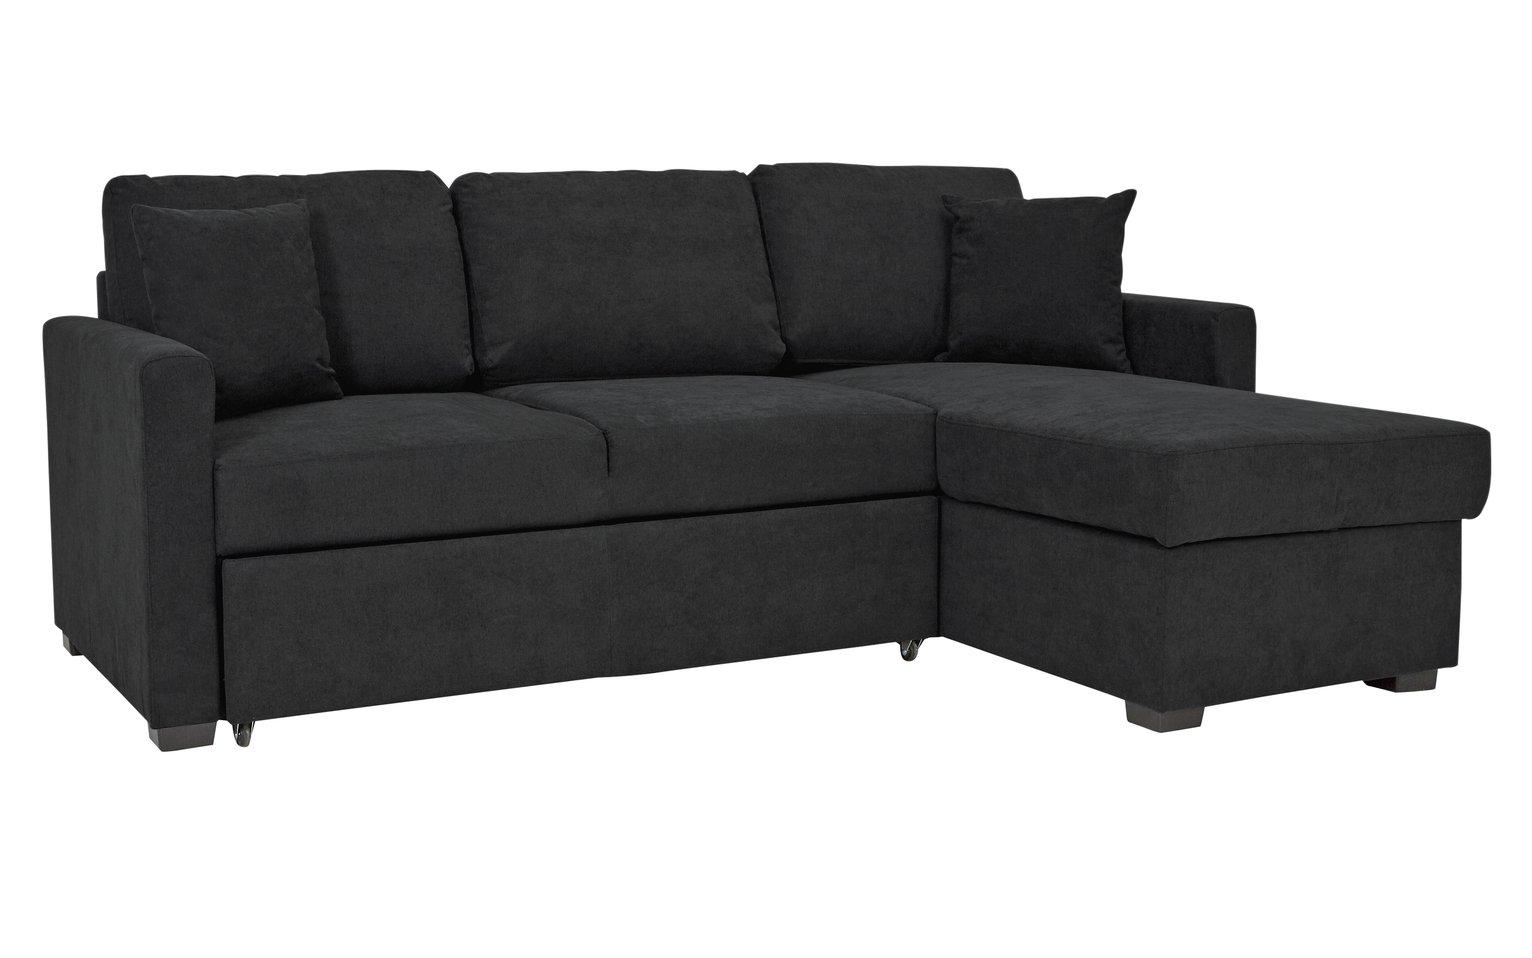 Argos Home Reagan Right Corner Fabric Sofa Bed - Charcoal